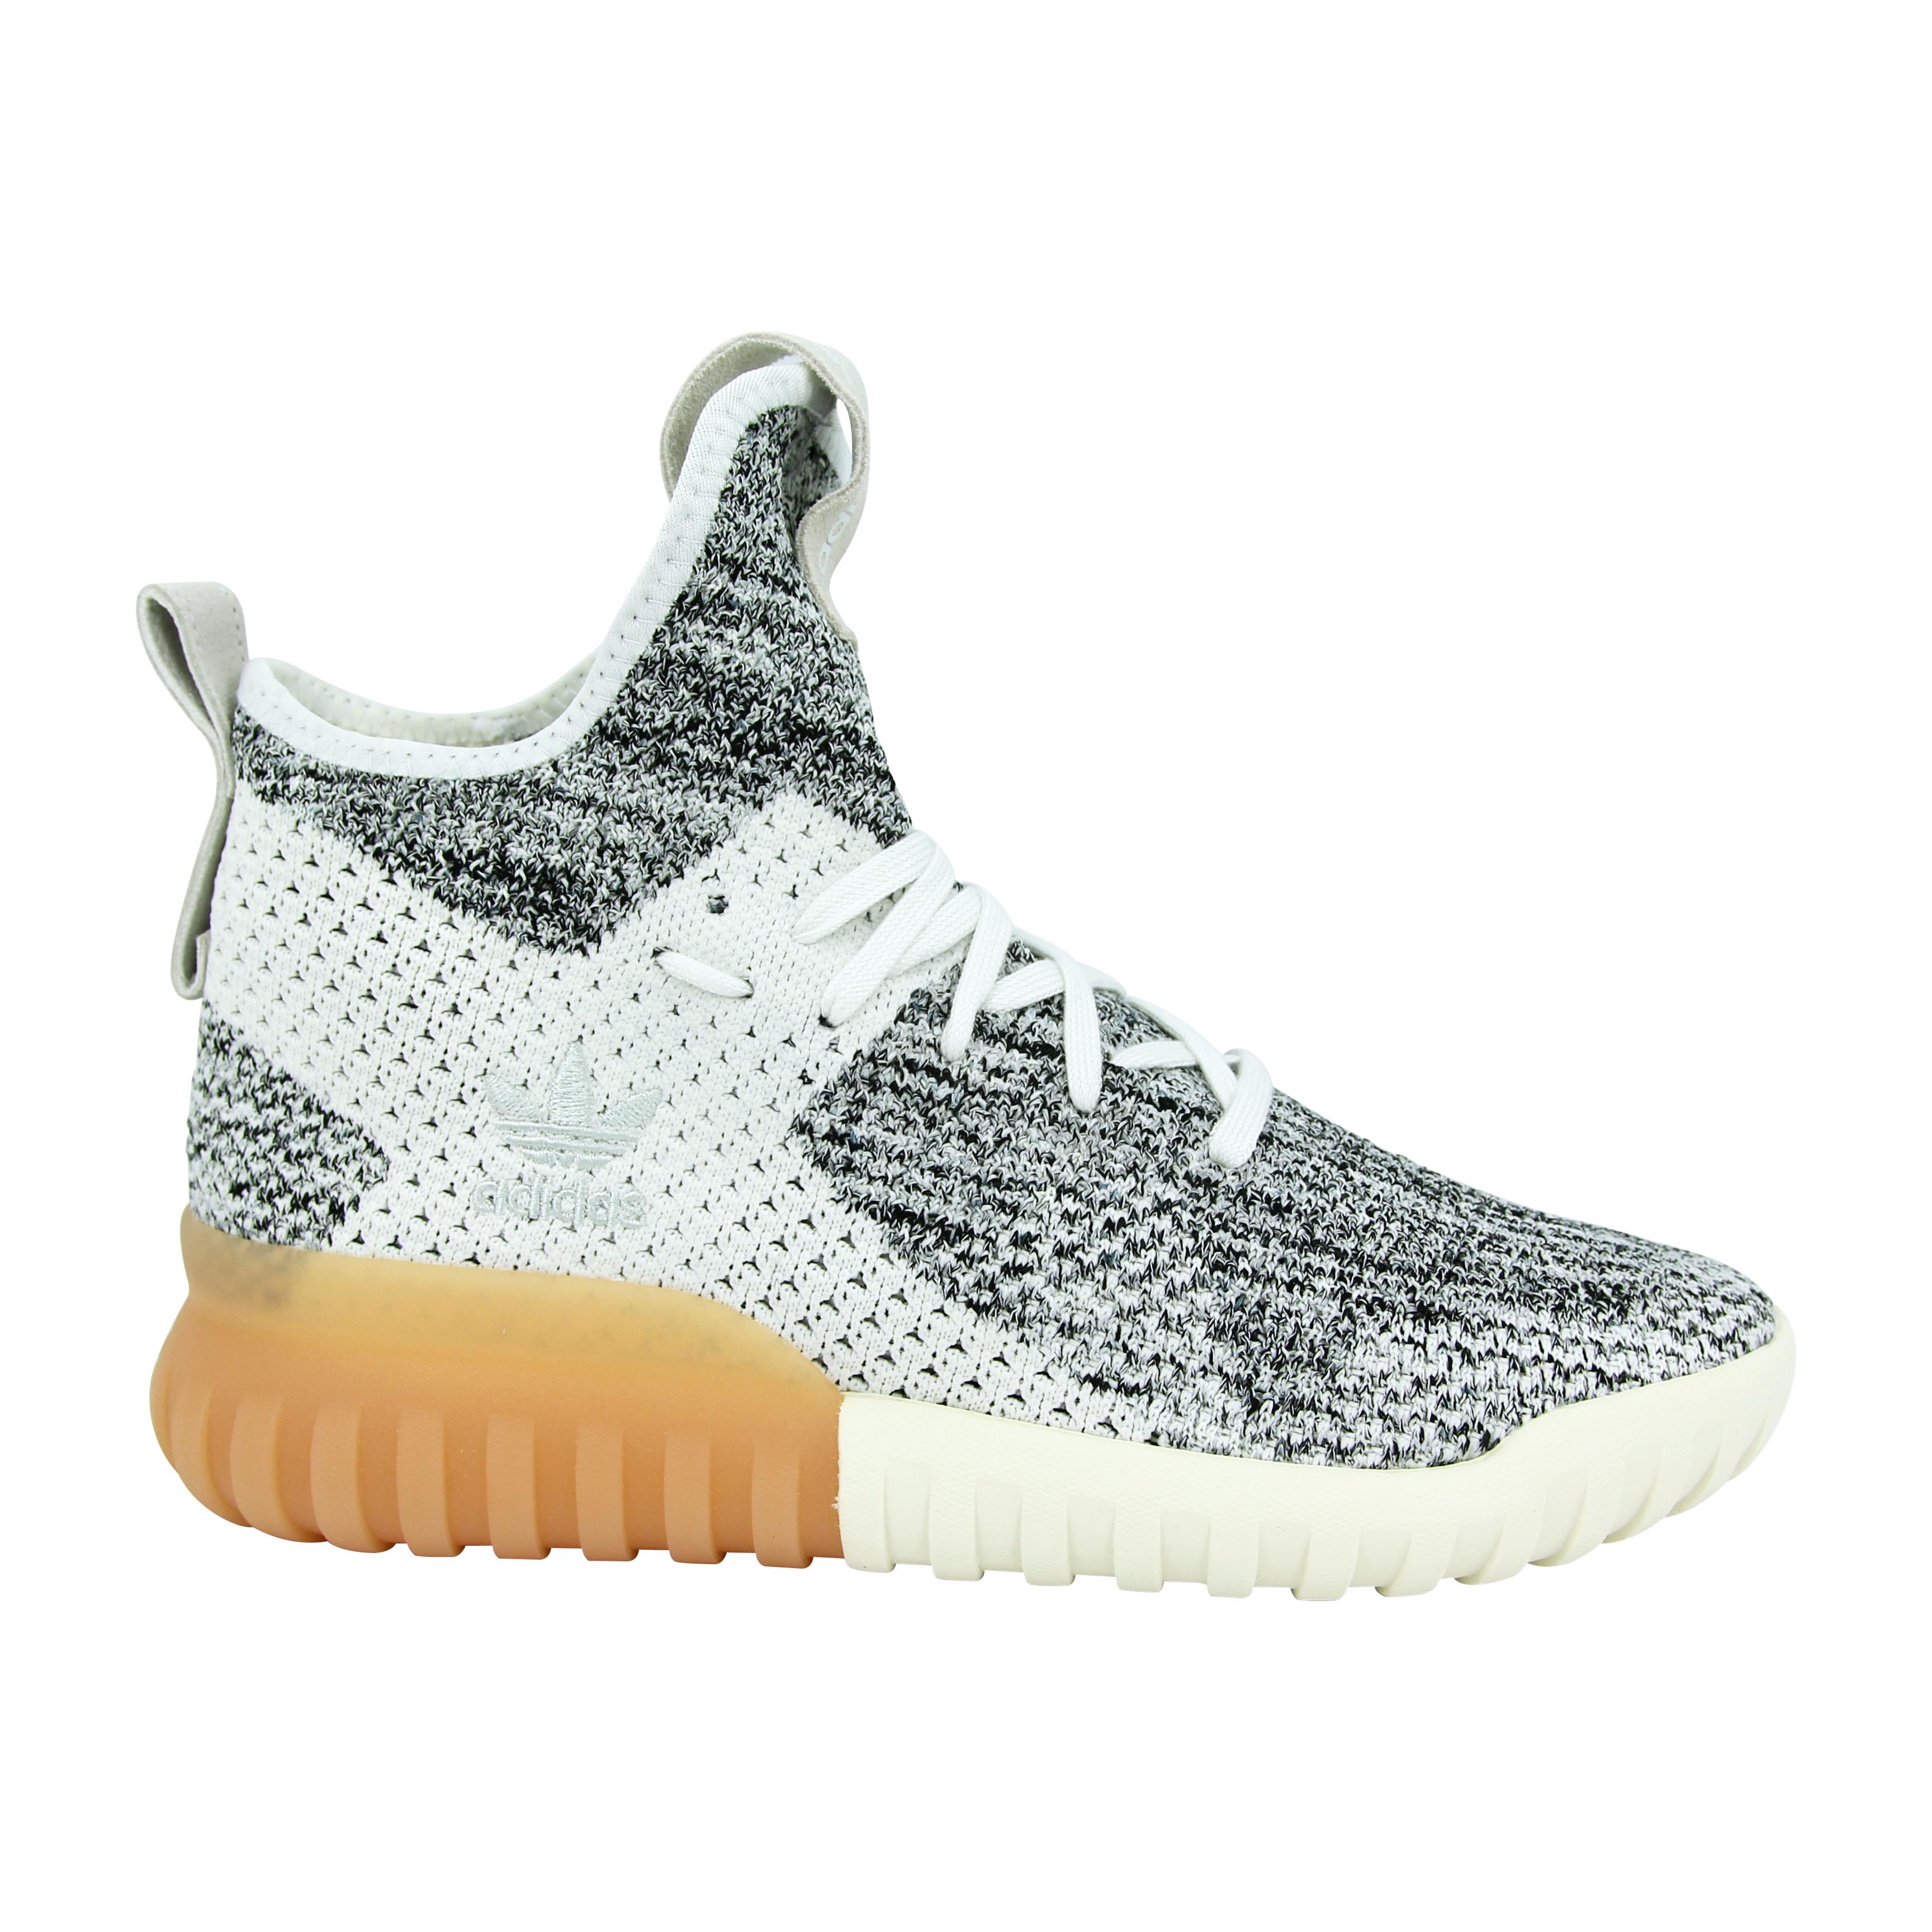 Schuhe Primeknit Sneakers Originals Tubular Unisex Neu X Adidas Tw6qYZw